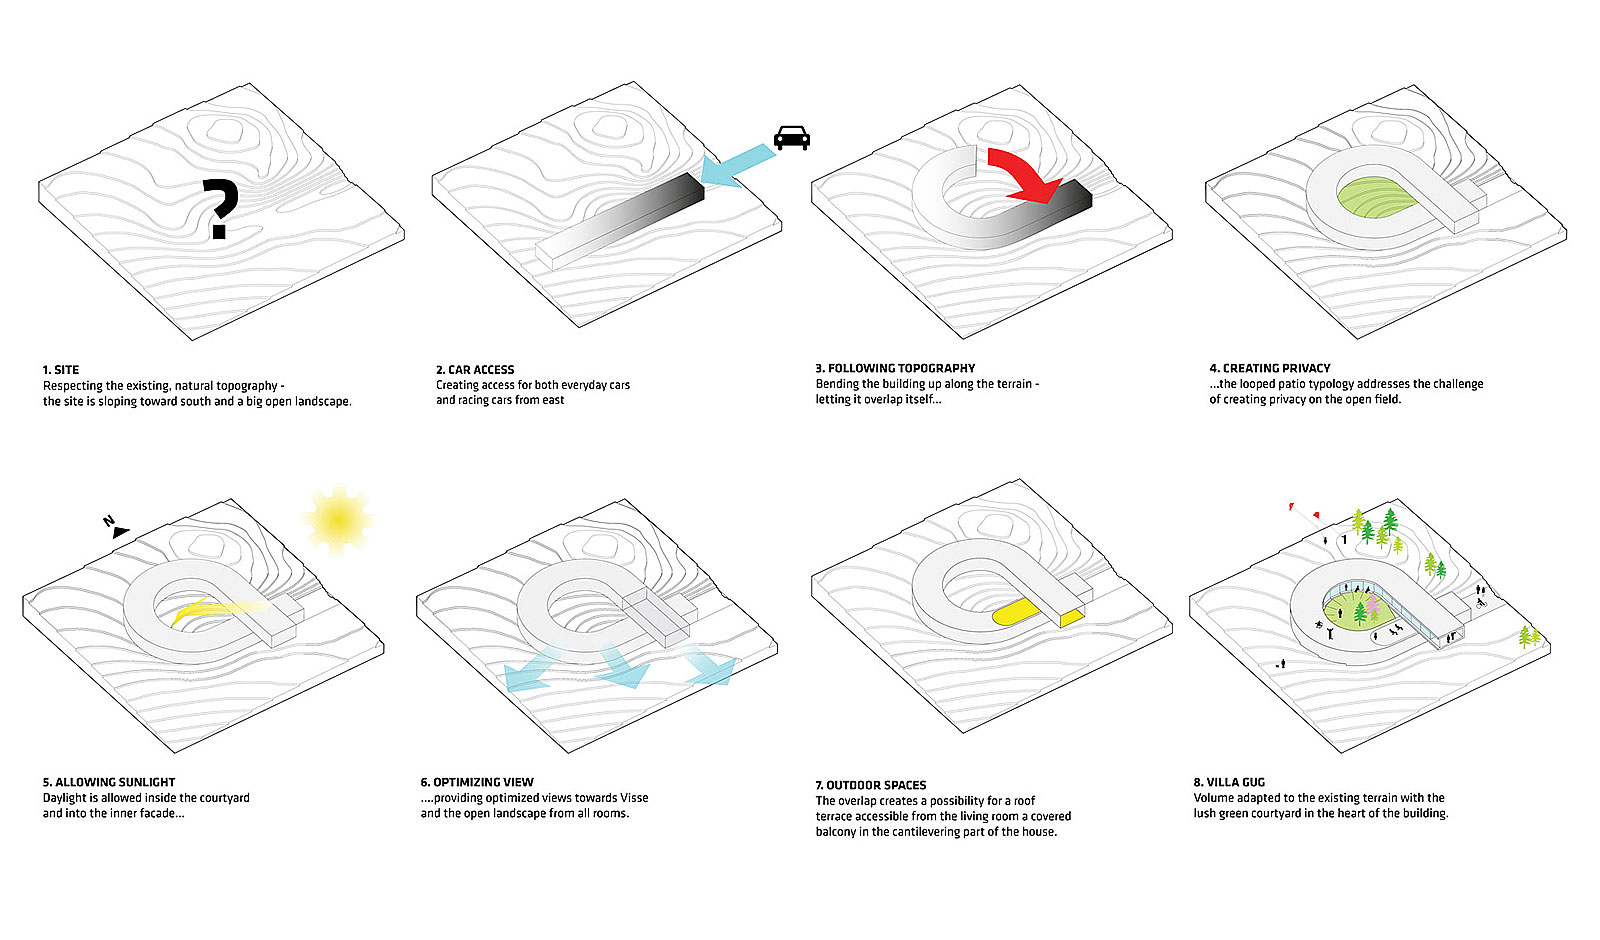 Studio Di Architettura In Inglese diagrammi di architettura: impara le strategie di bjarke ingels.